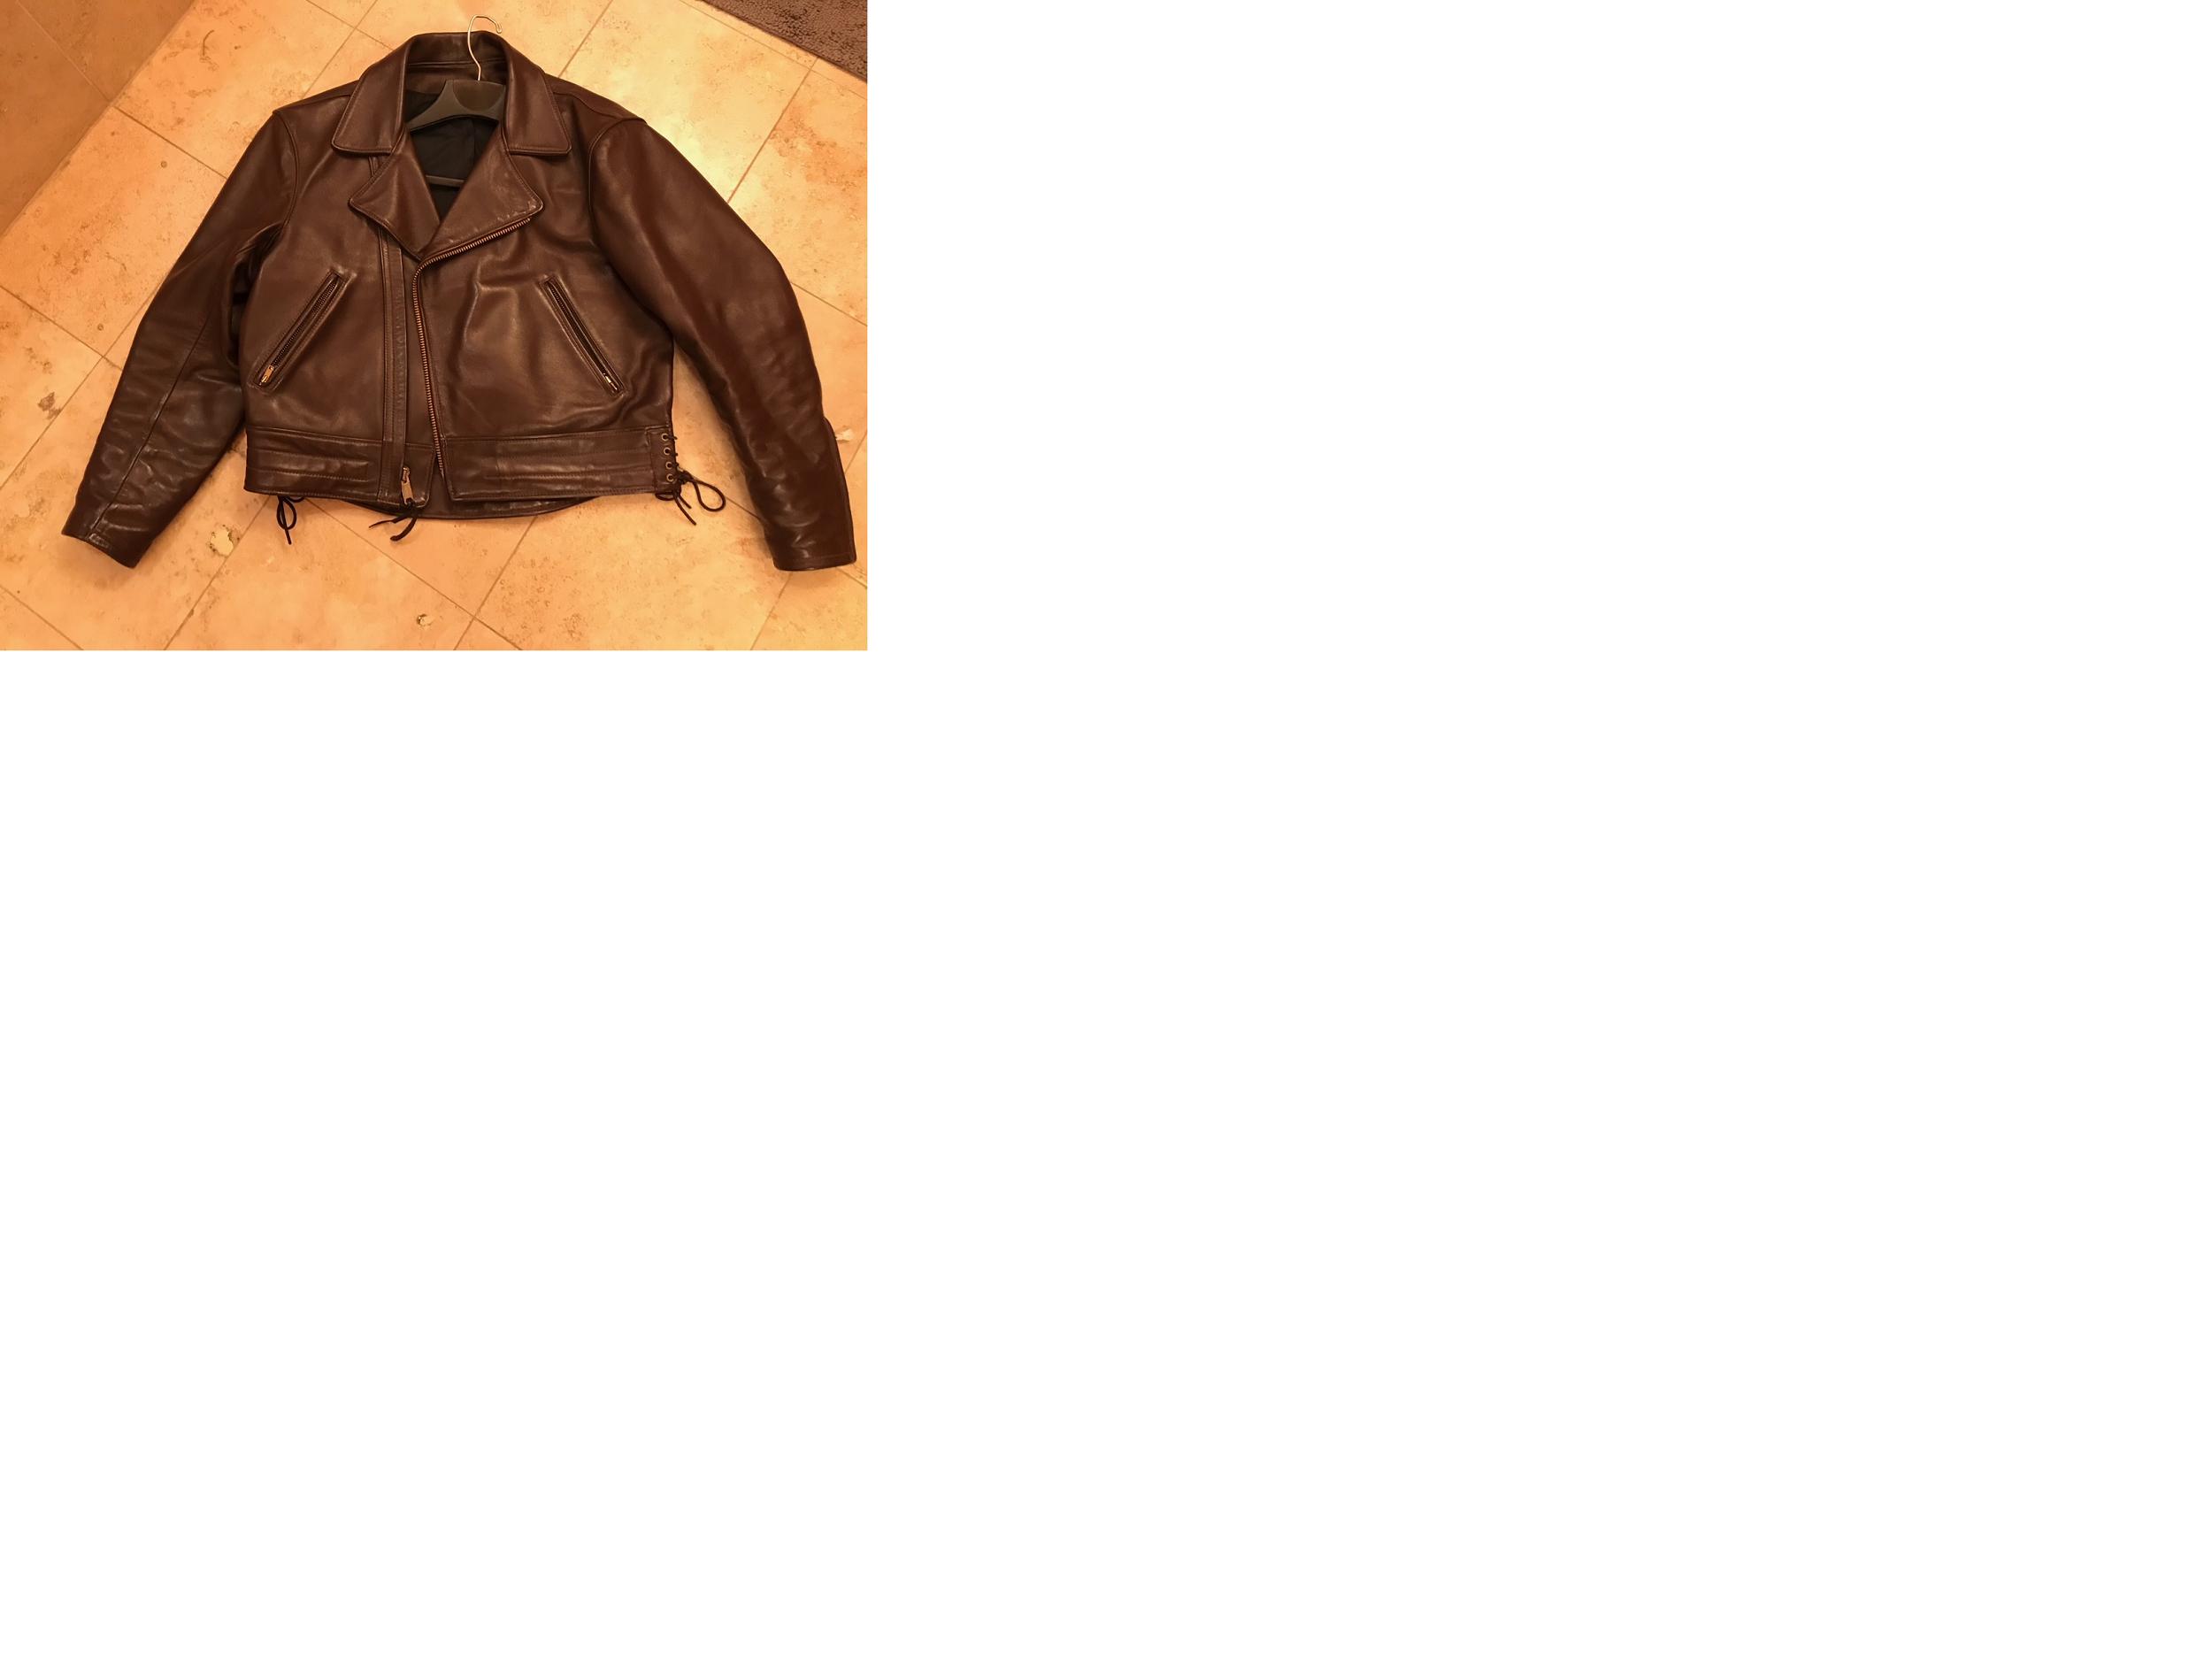 Jacket11.png